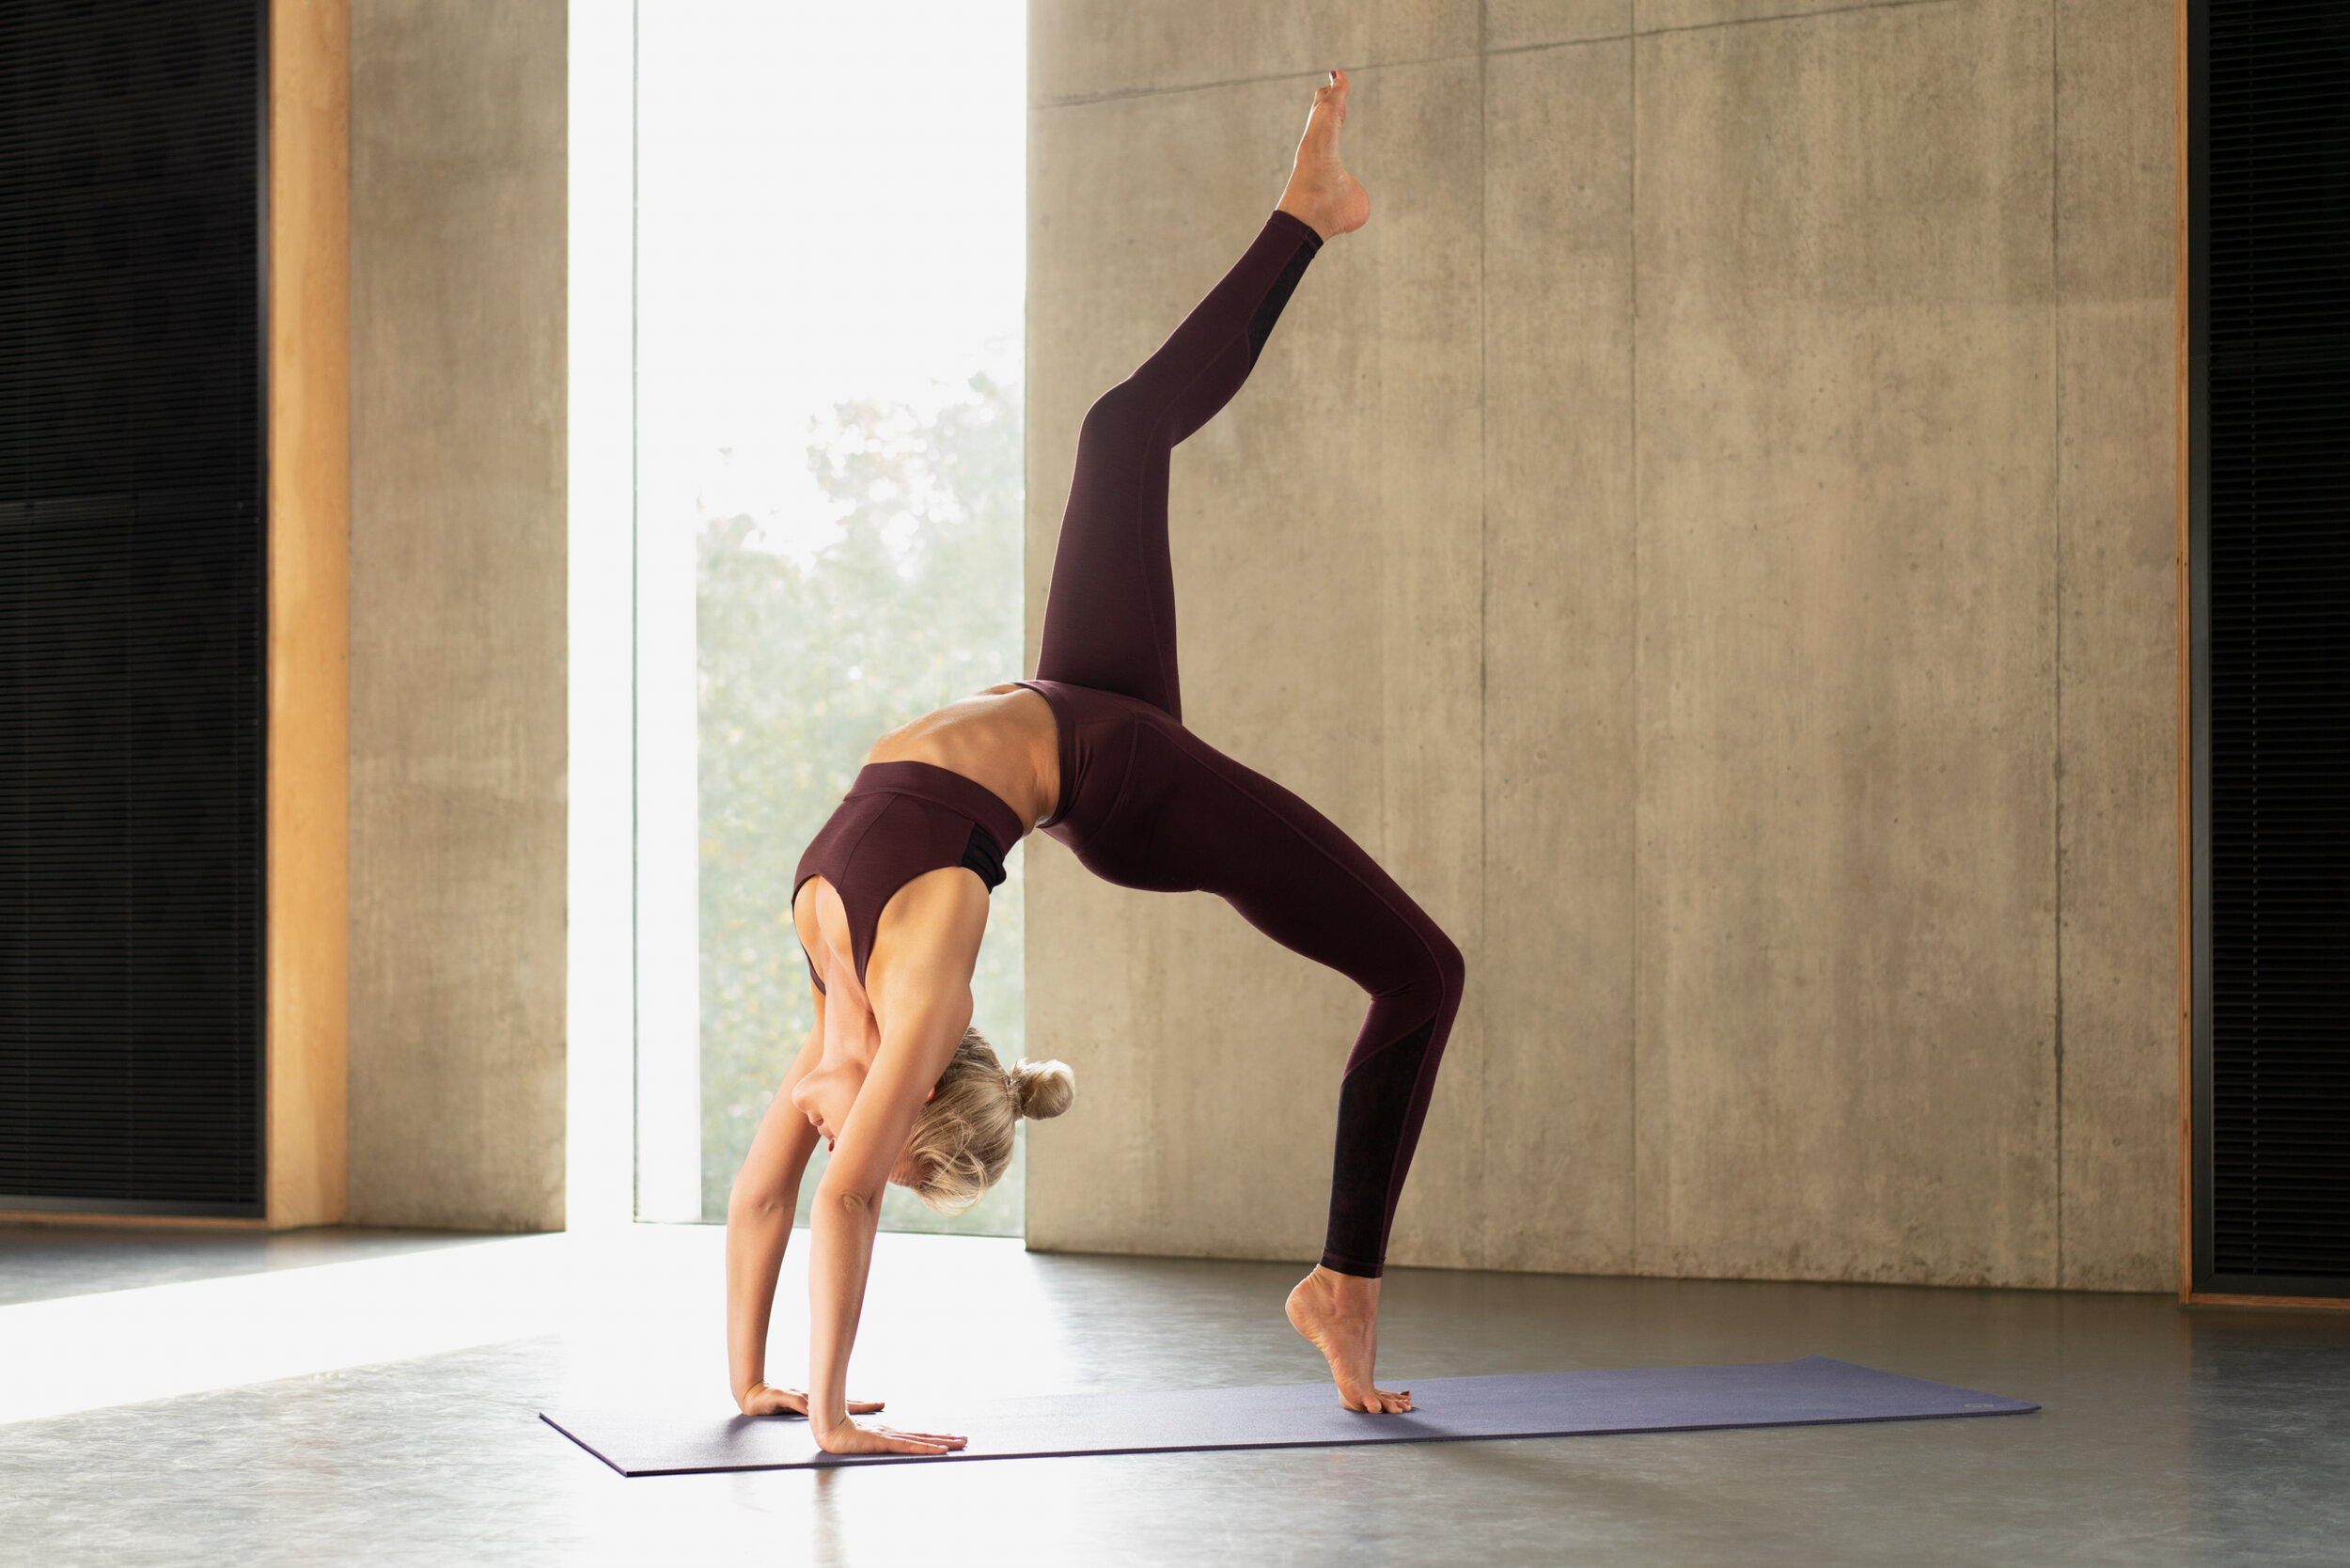 20190830_Anna_Yoga_stills_050 Anna_web 1.jpg